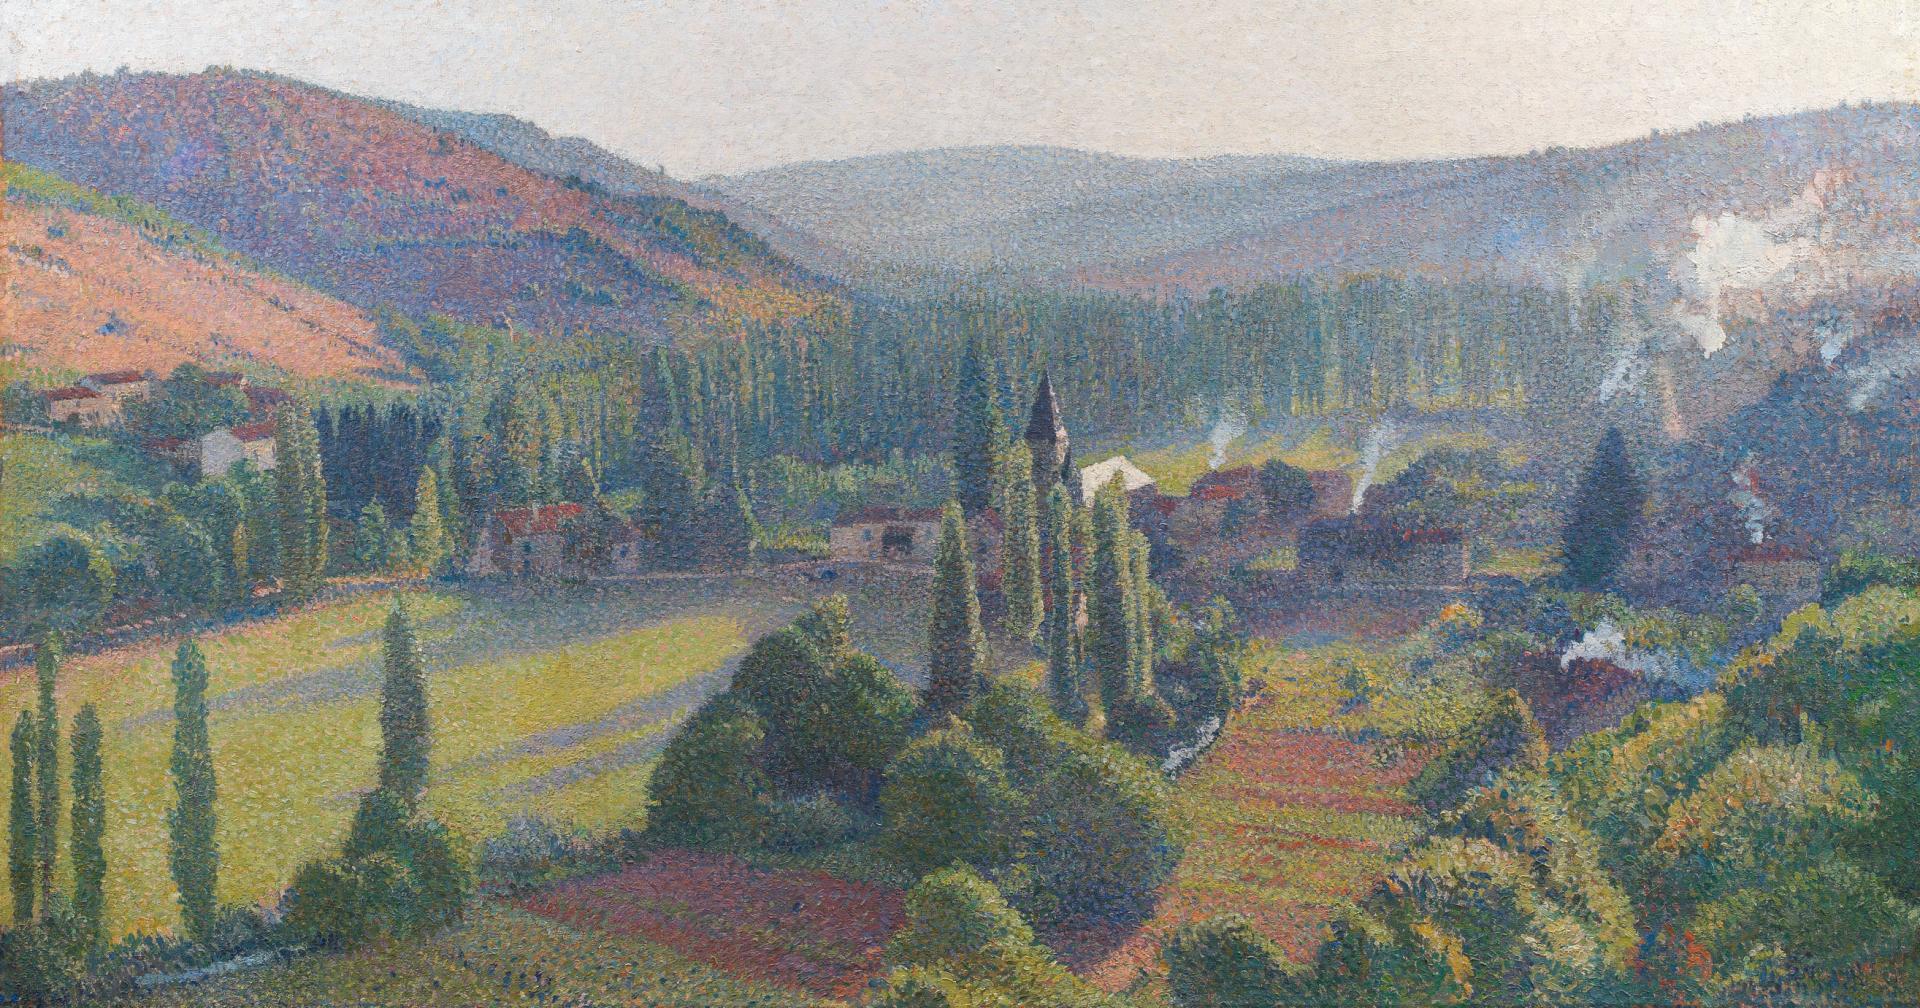 HM La vallée du Vert MCHM